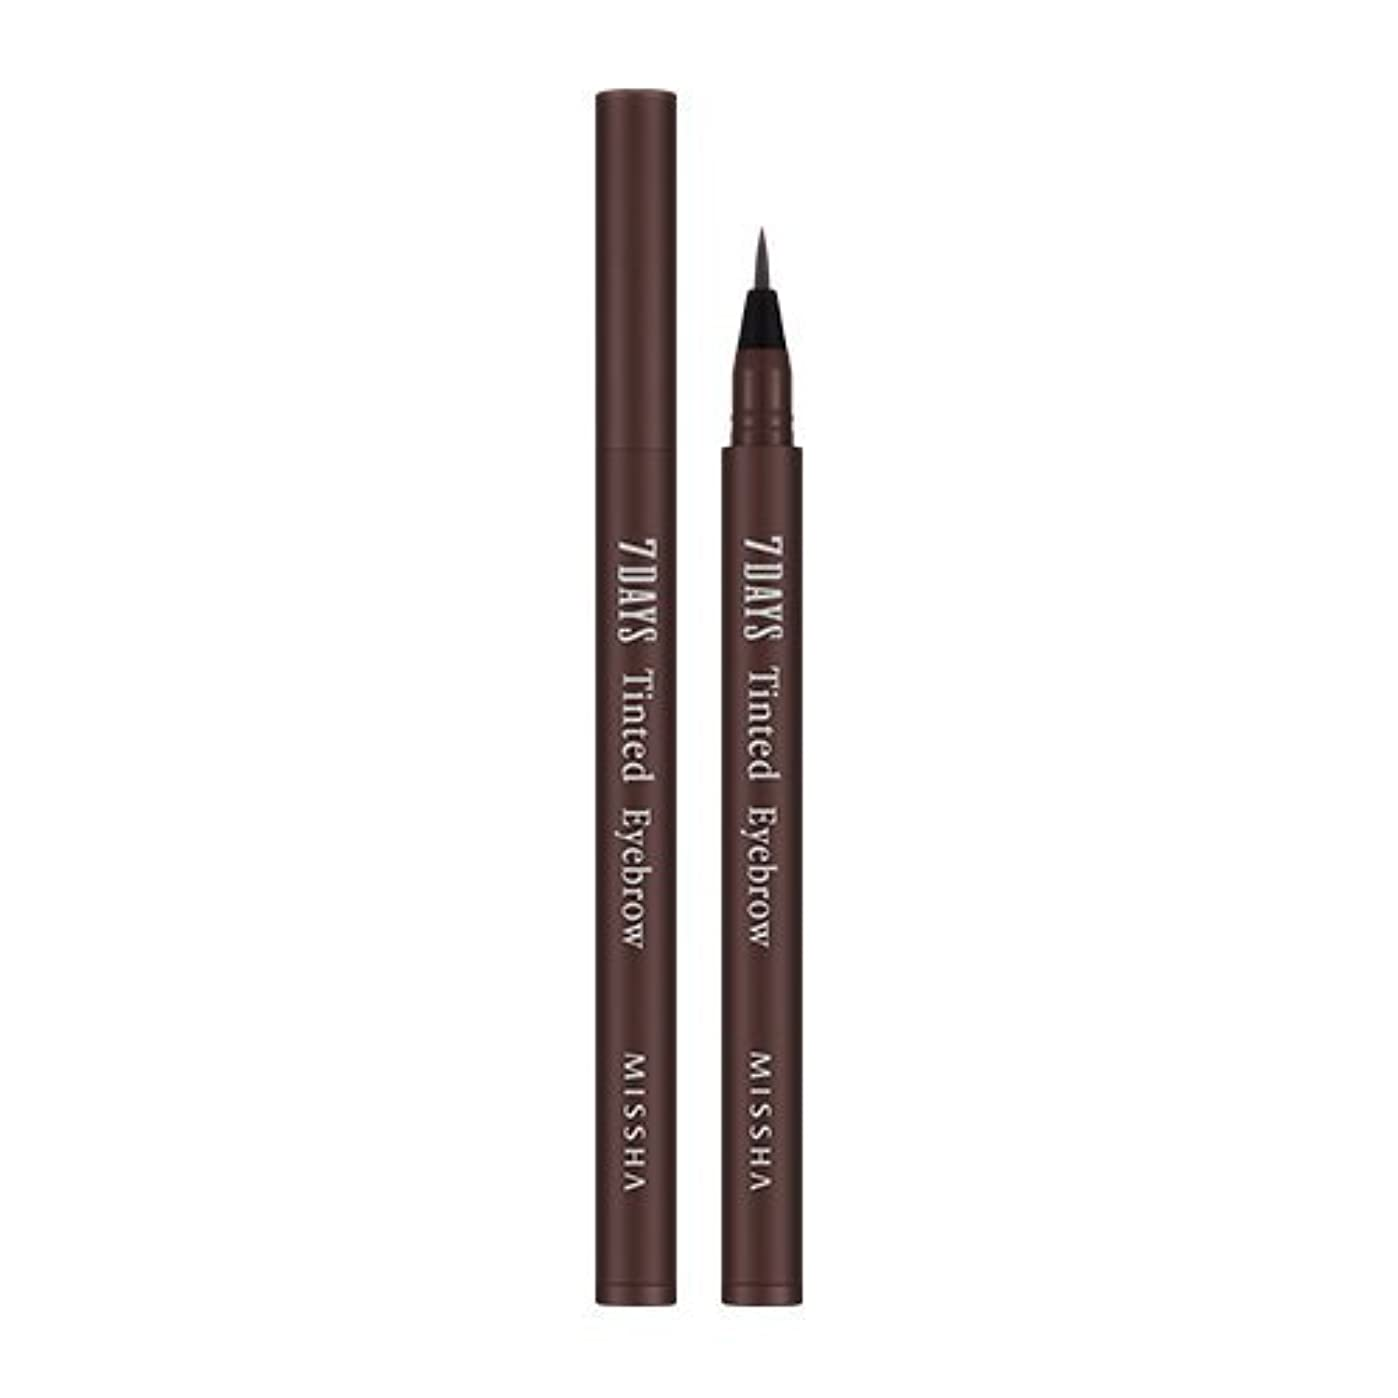 MISSHA Seven Days Tinted Eye Brow 0.8ml (#01 Maroon Brown)/ミシャ セブンデイズ ティンテッド アイブロウ 0.8ml (#01 Maroon Brown)